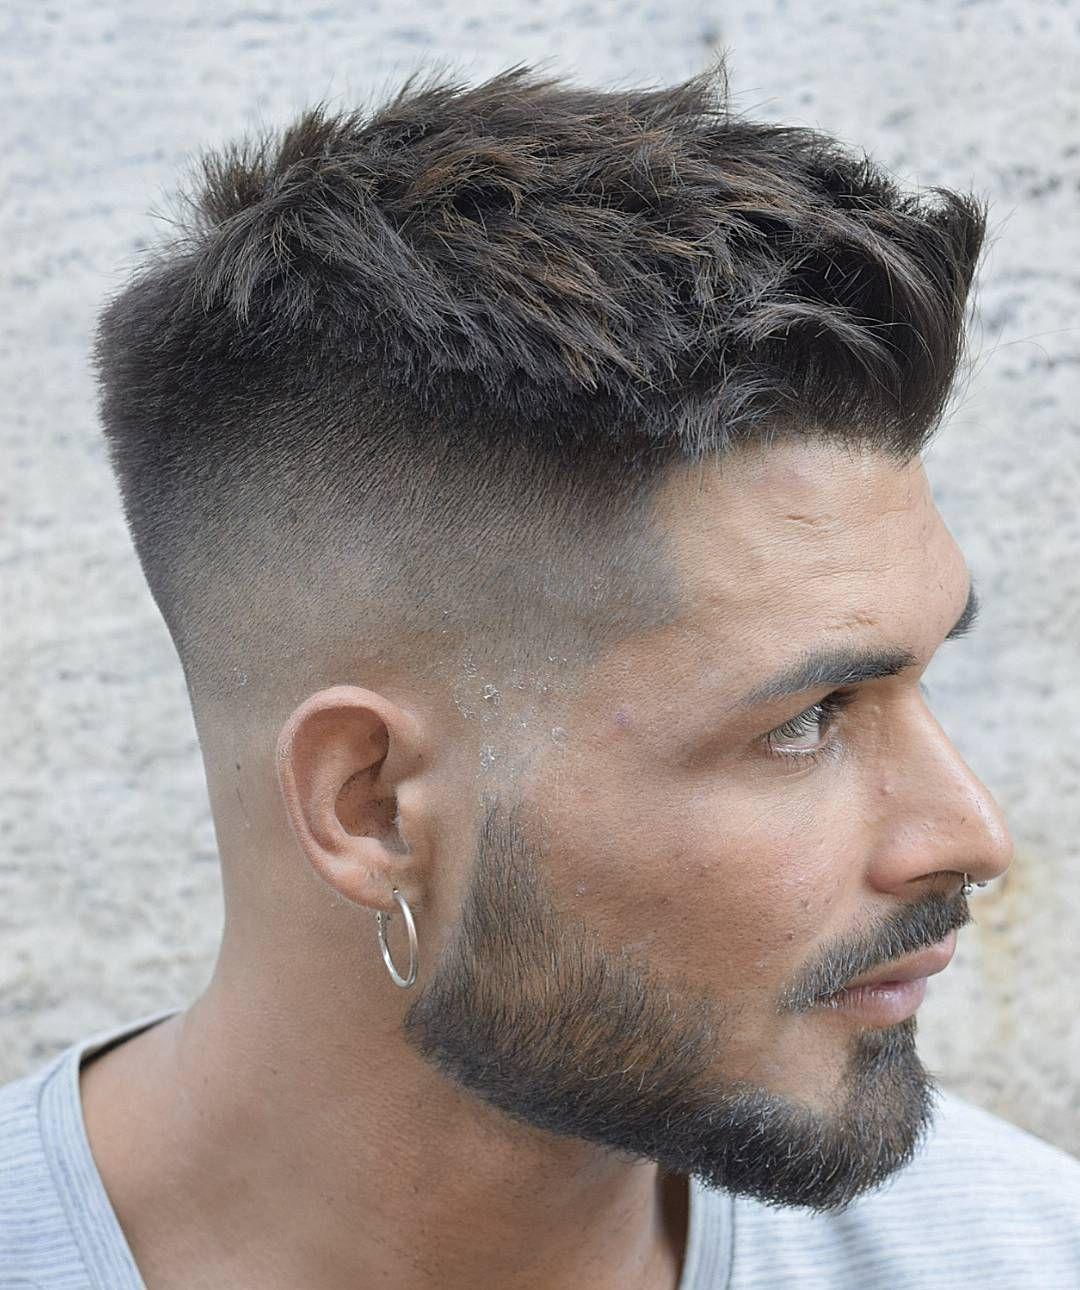 Men haircuts short alebbarber short mens haircut  h a i r  pinterest  haircuts